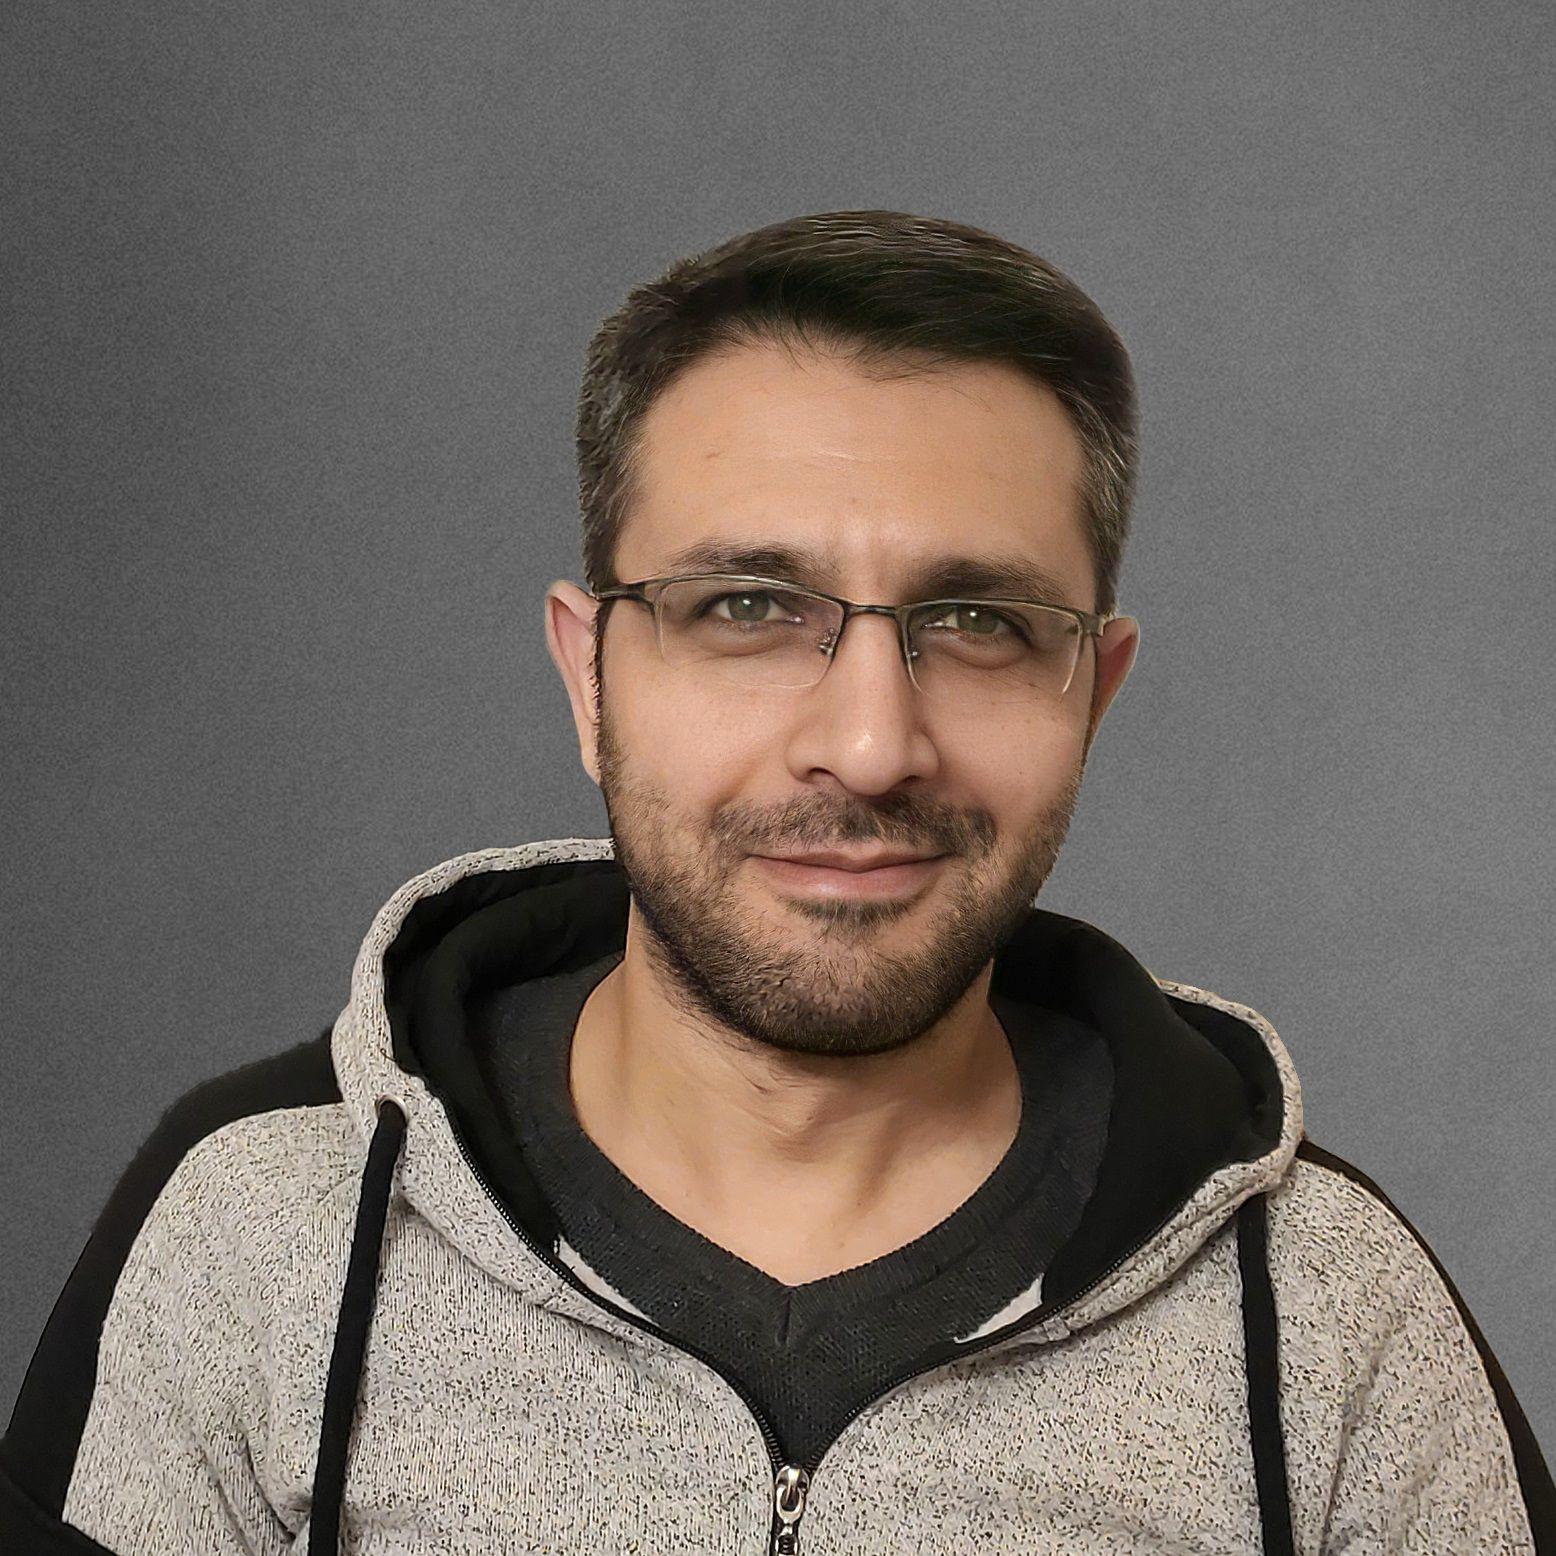 Davit Ayvazyan Hacker Noon profile picture